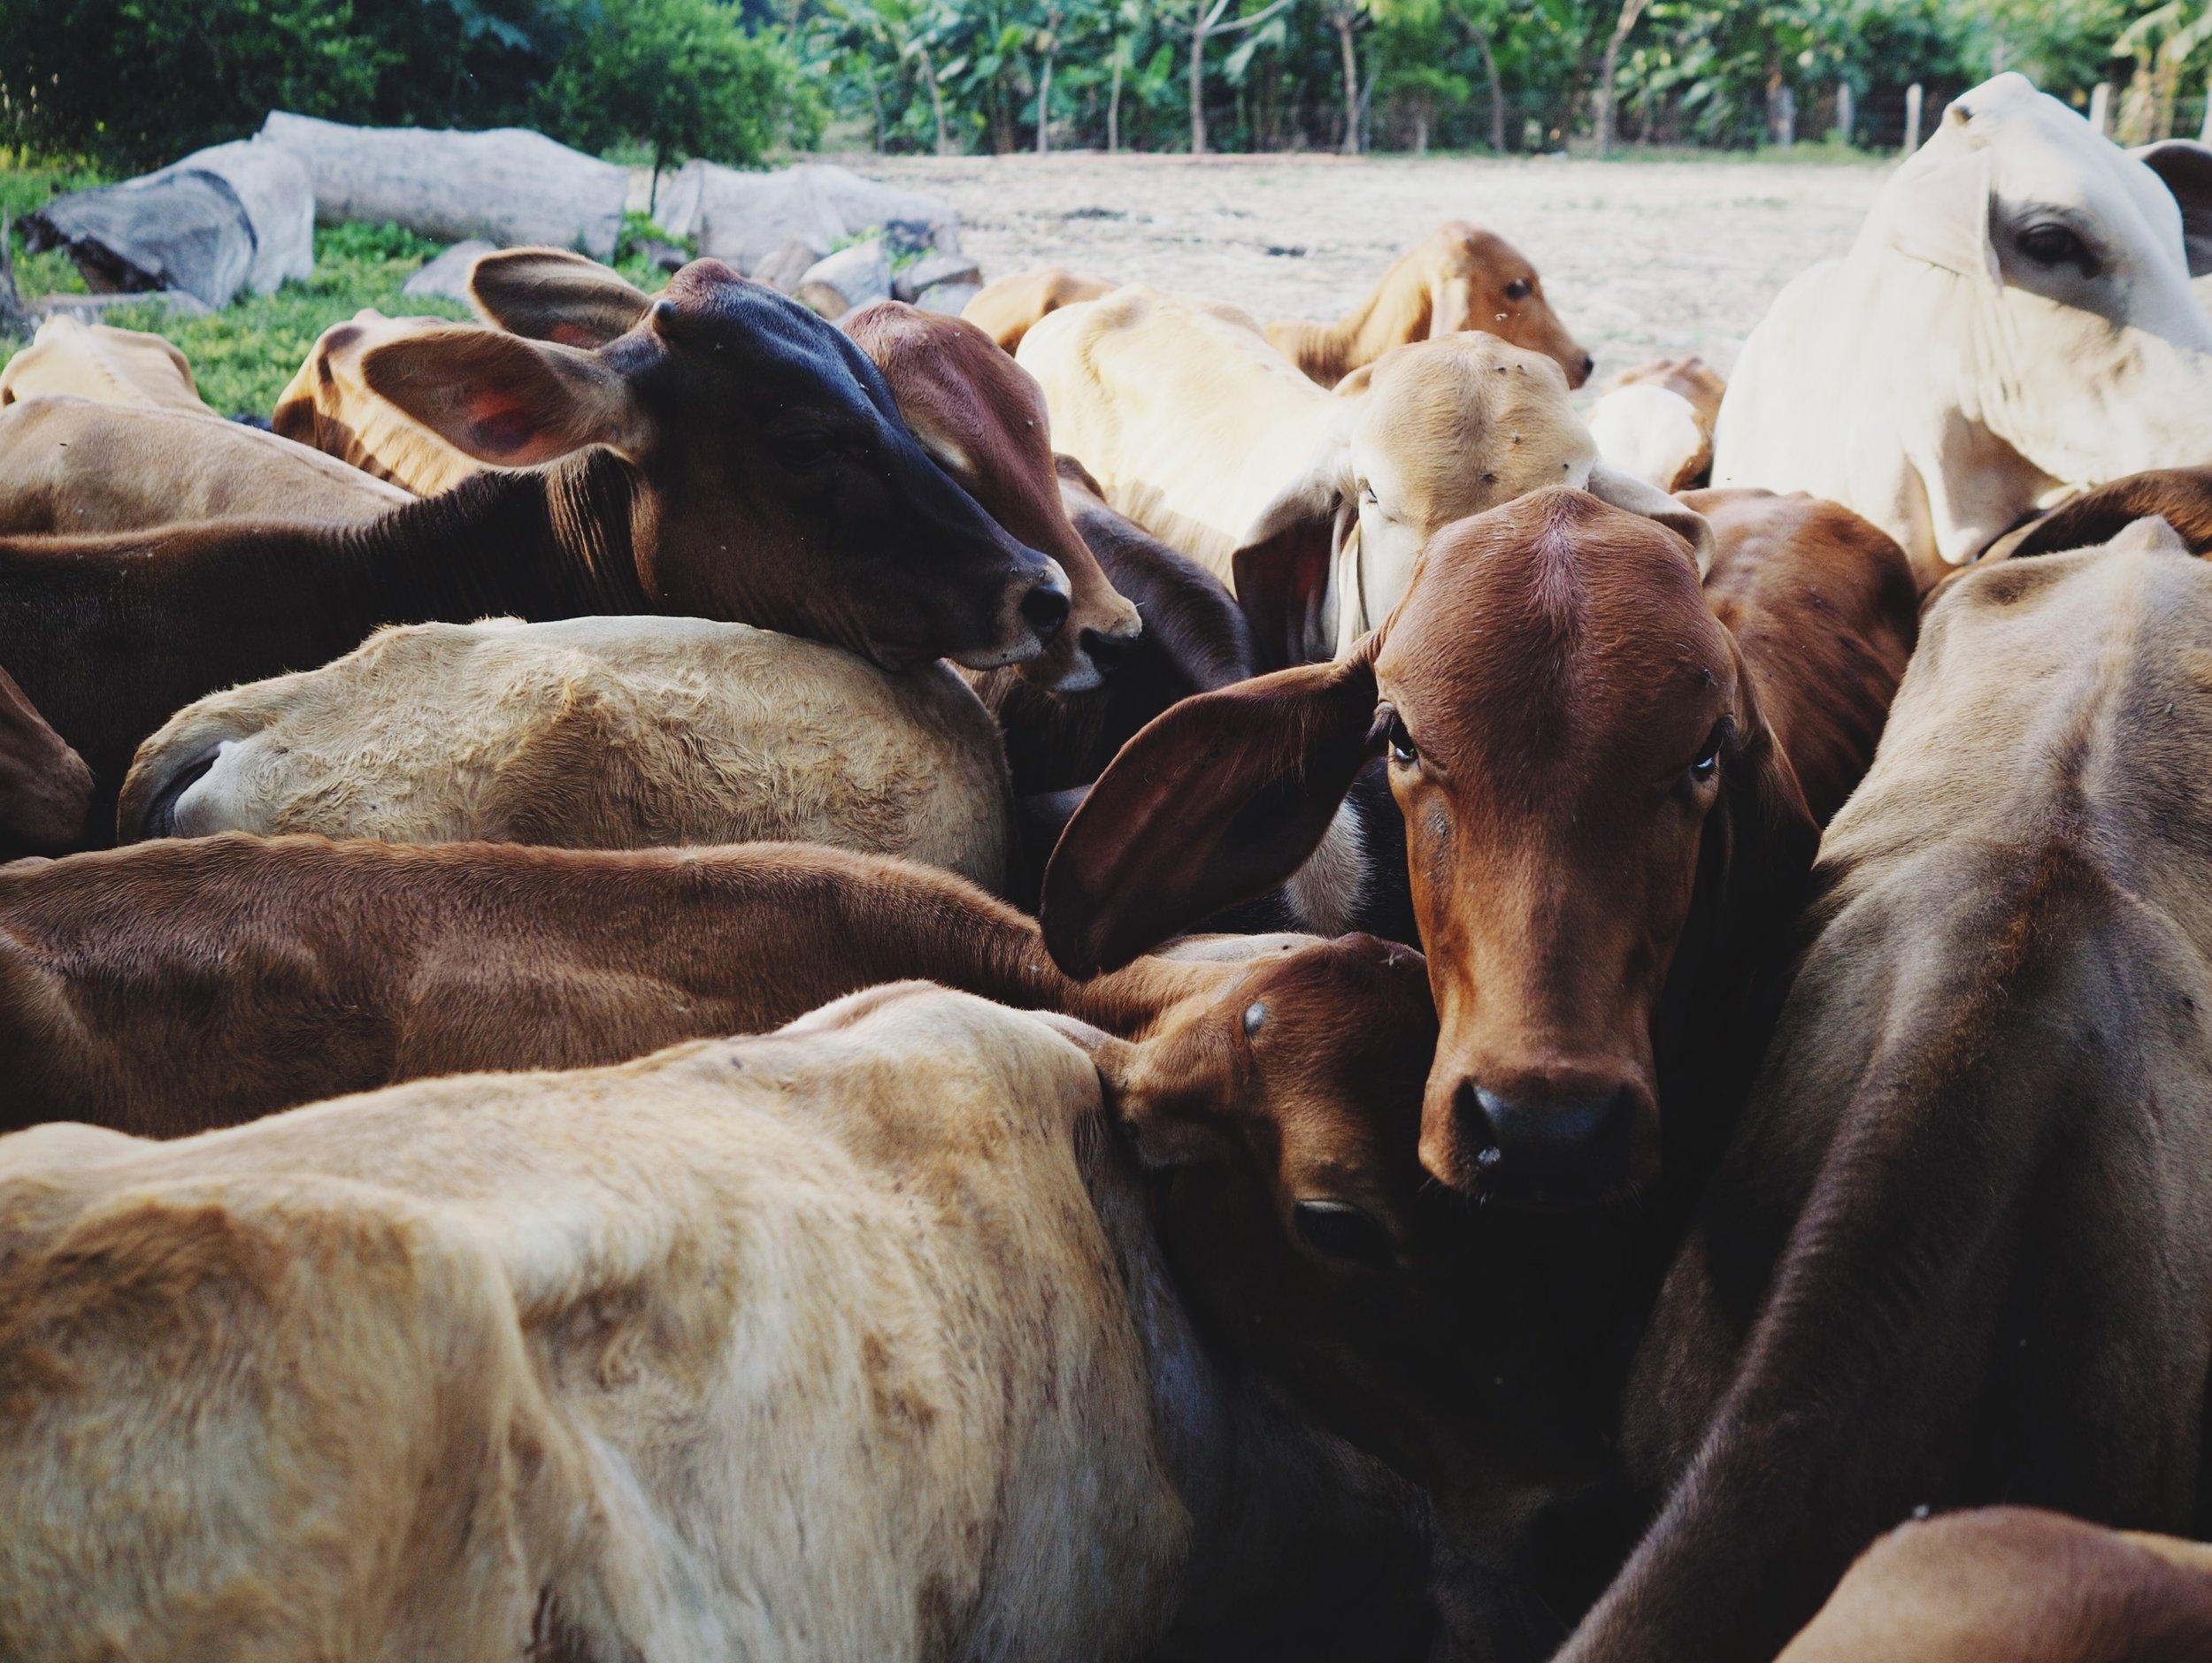 Calves at the family farm